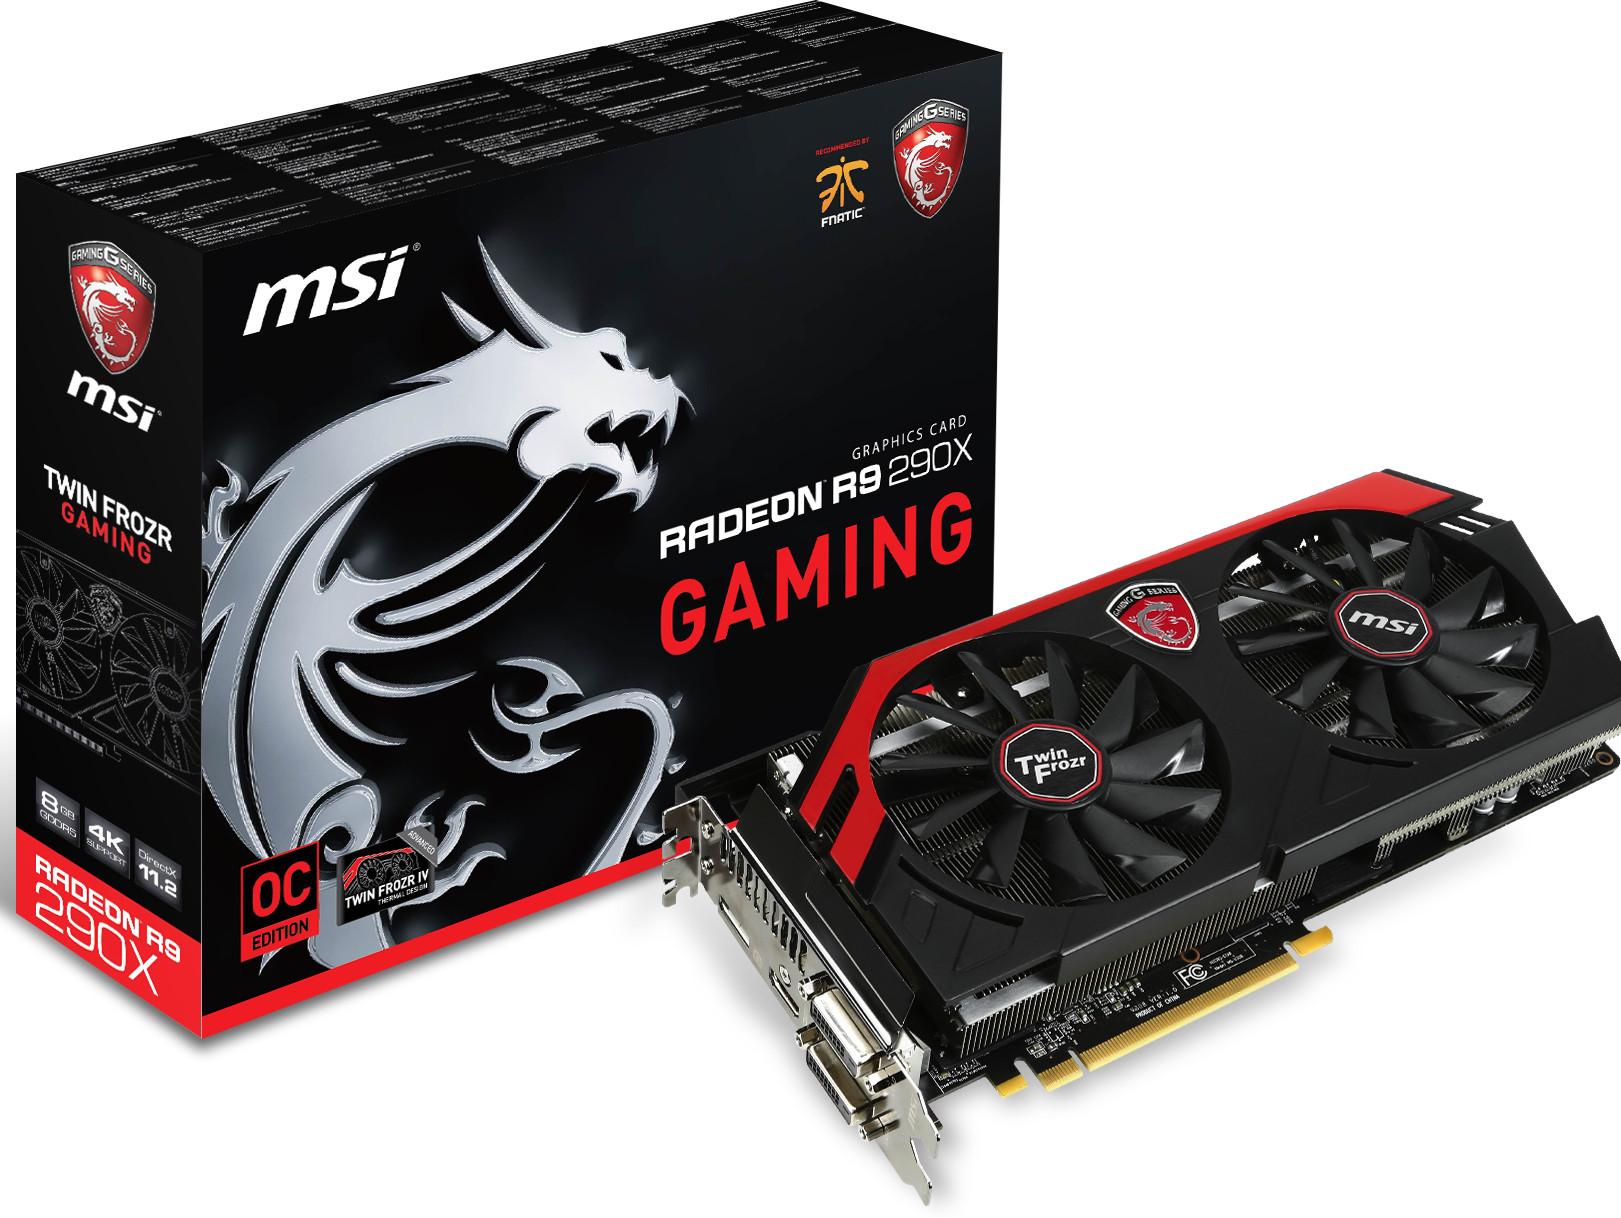 MSI Announces Radeon R9 290X Gaming 8GB Graphics Card techPowerUp rO7DiCu1